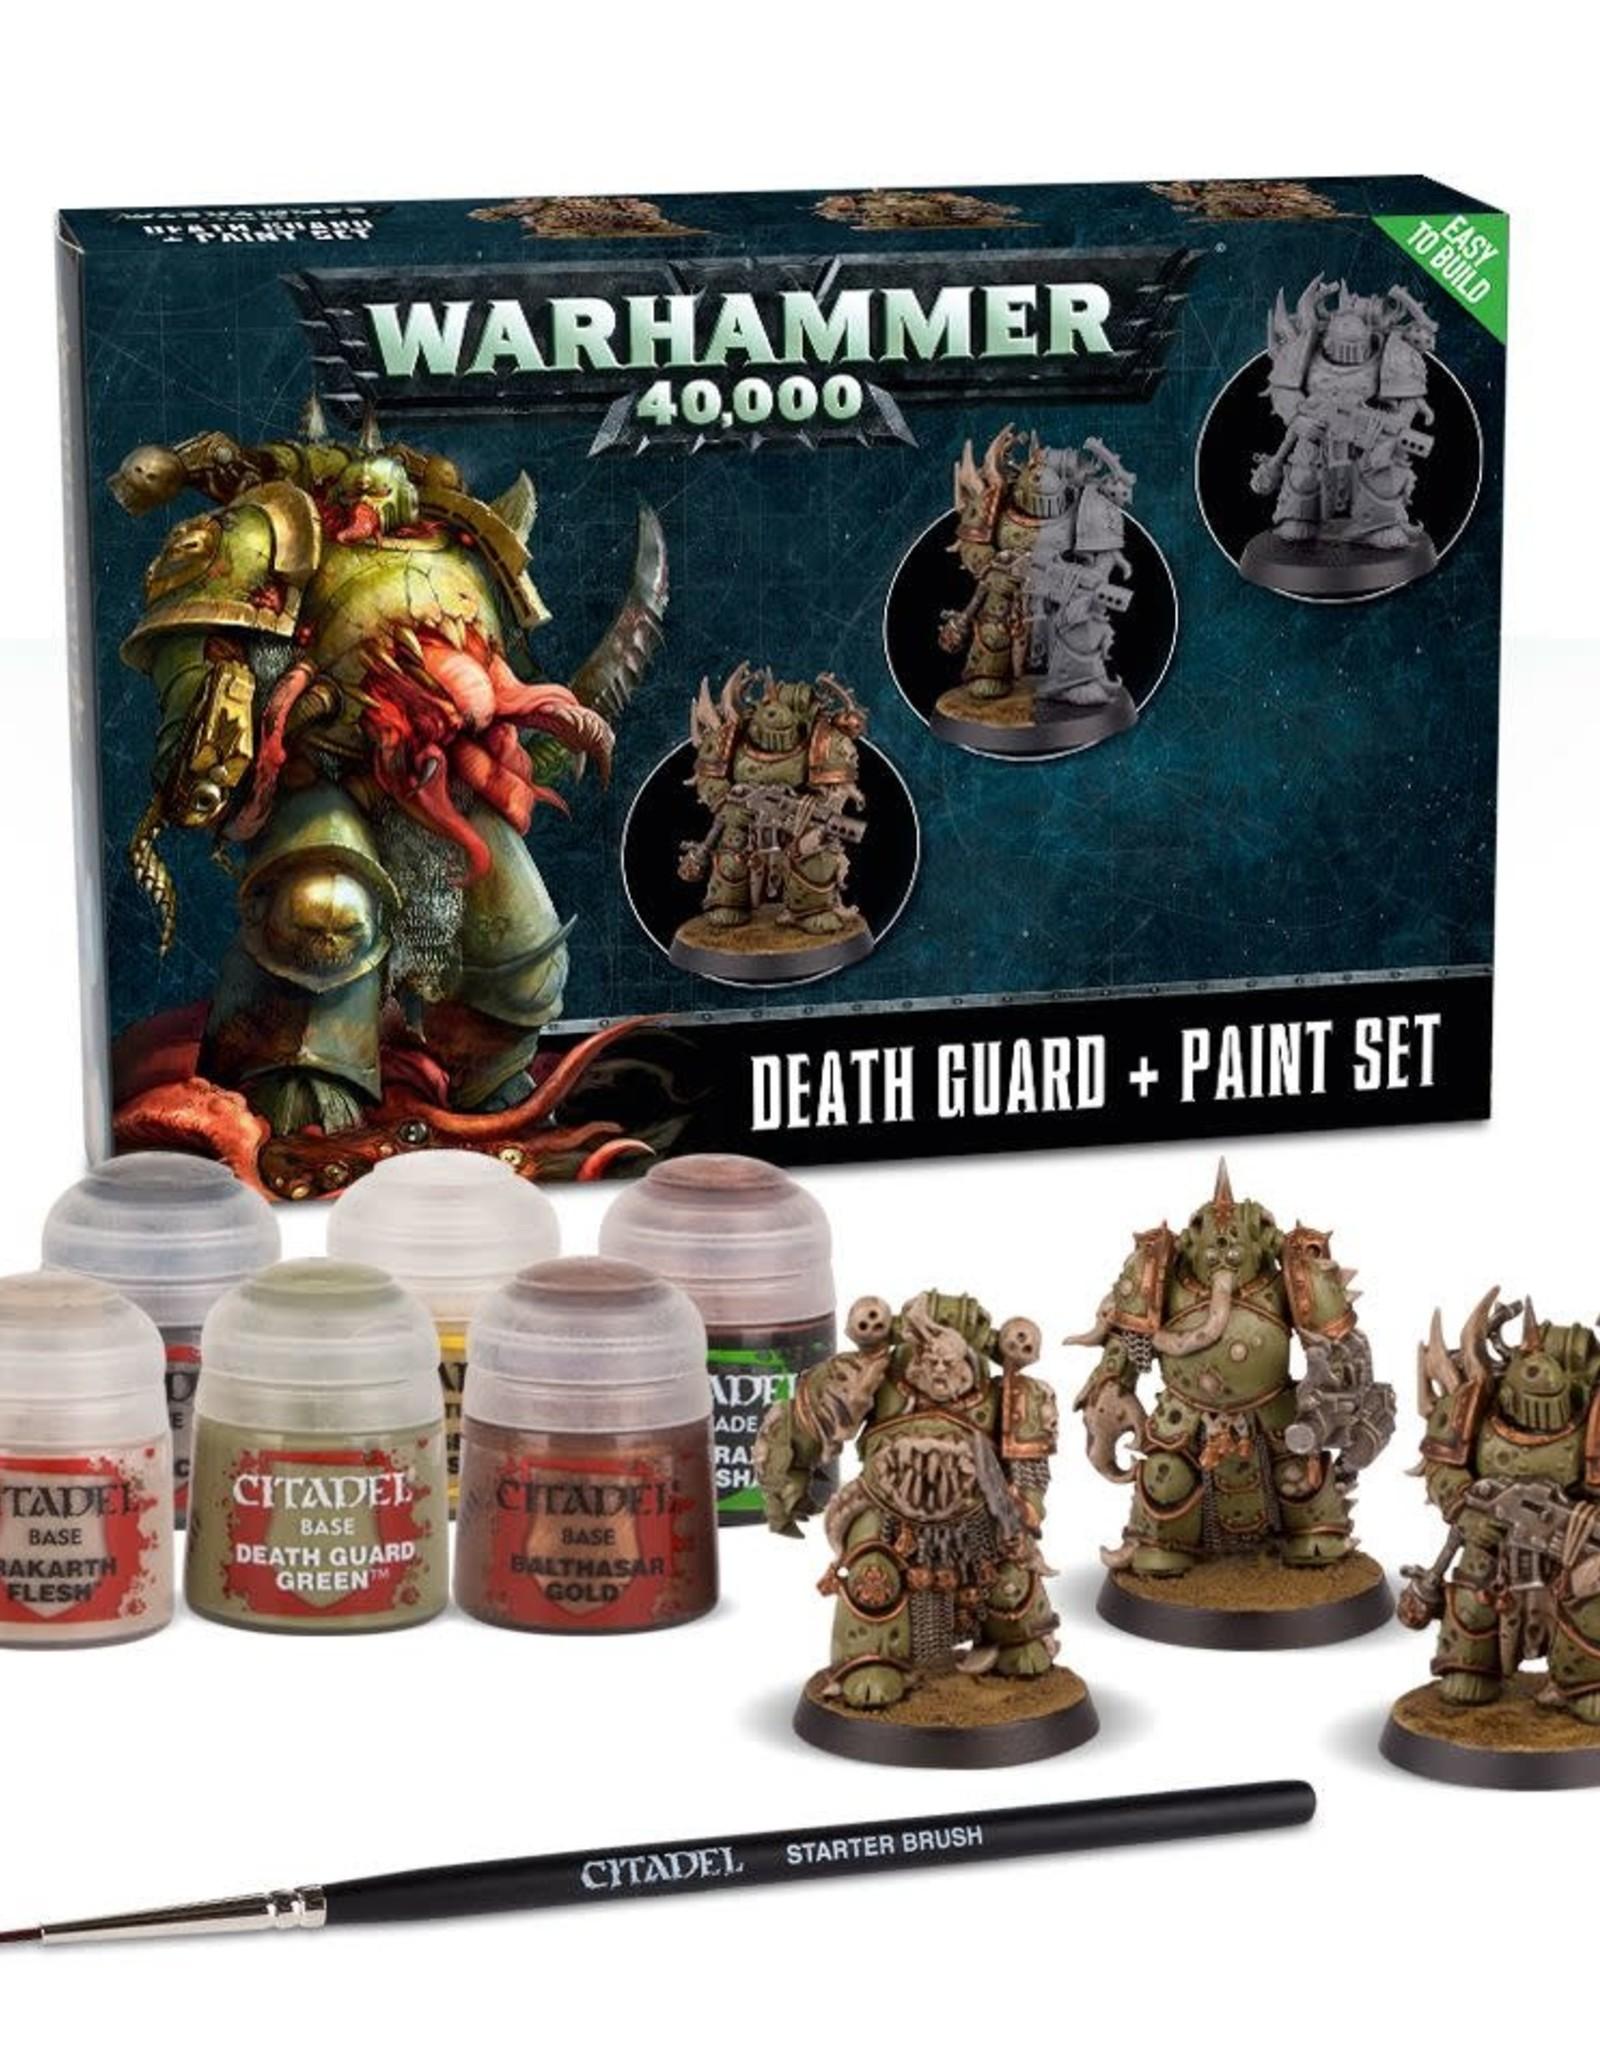 Warhammer 40K Death Guard & Paint Set